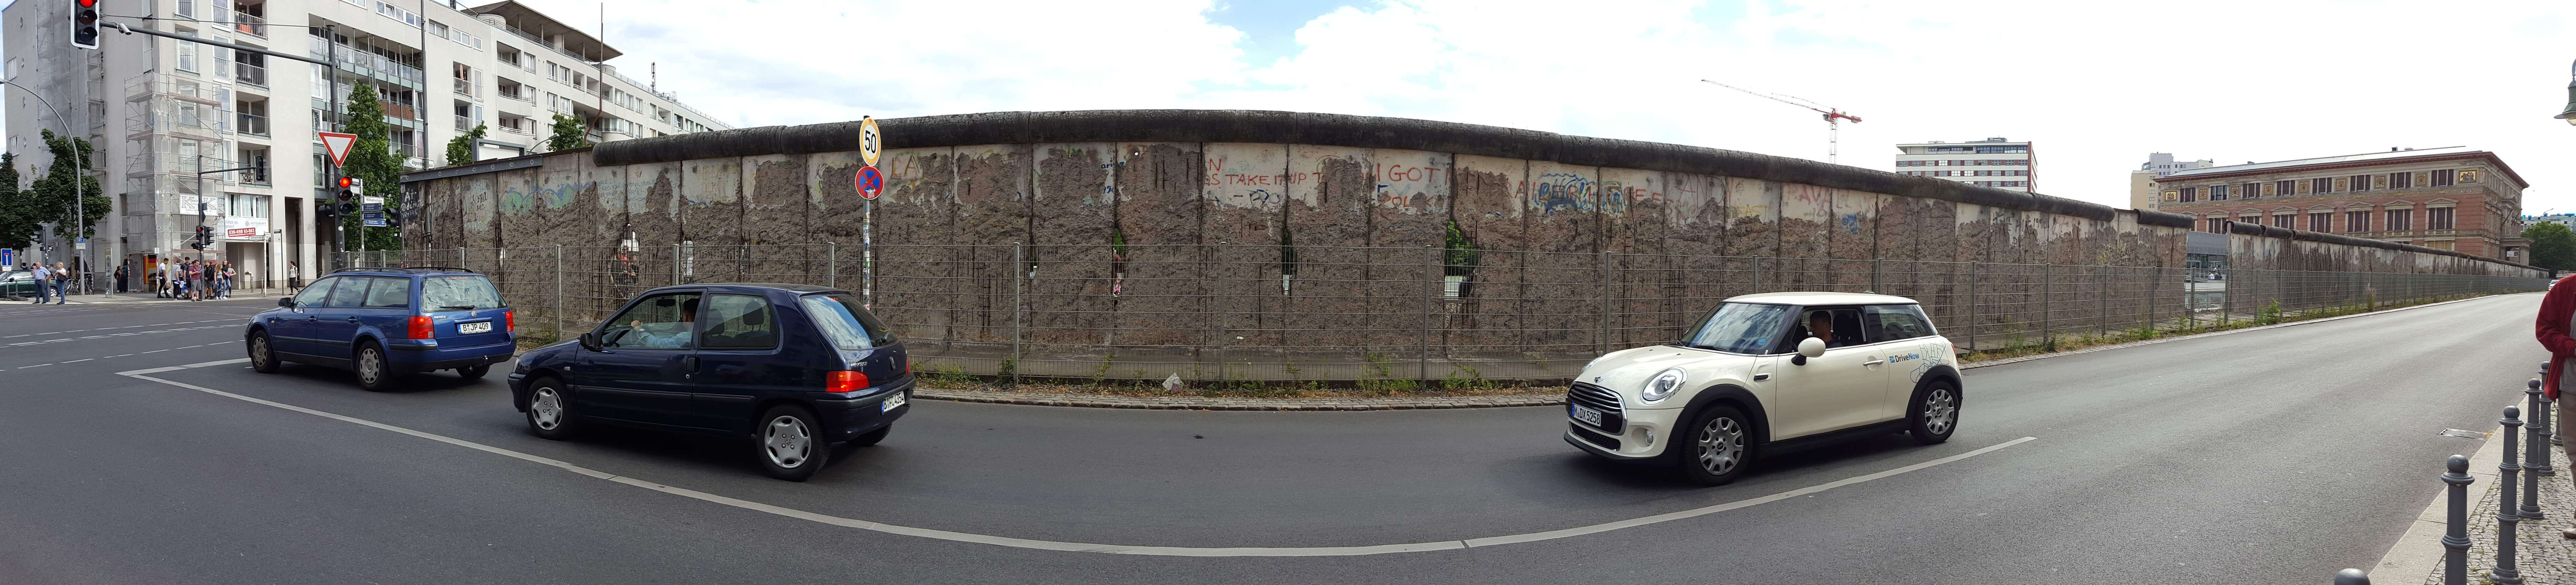 Berlin Wall Panorama